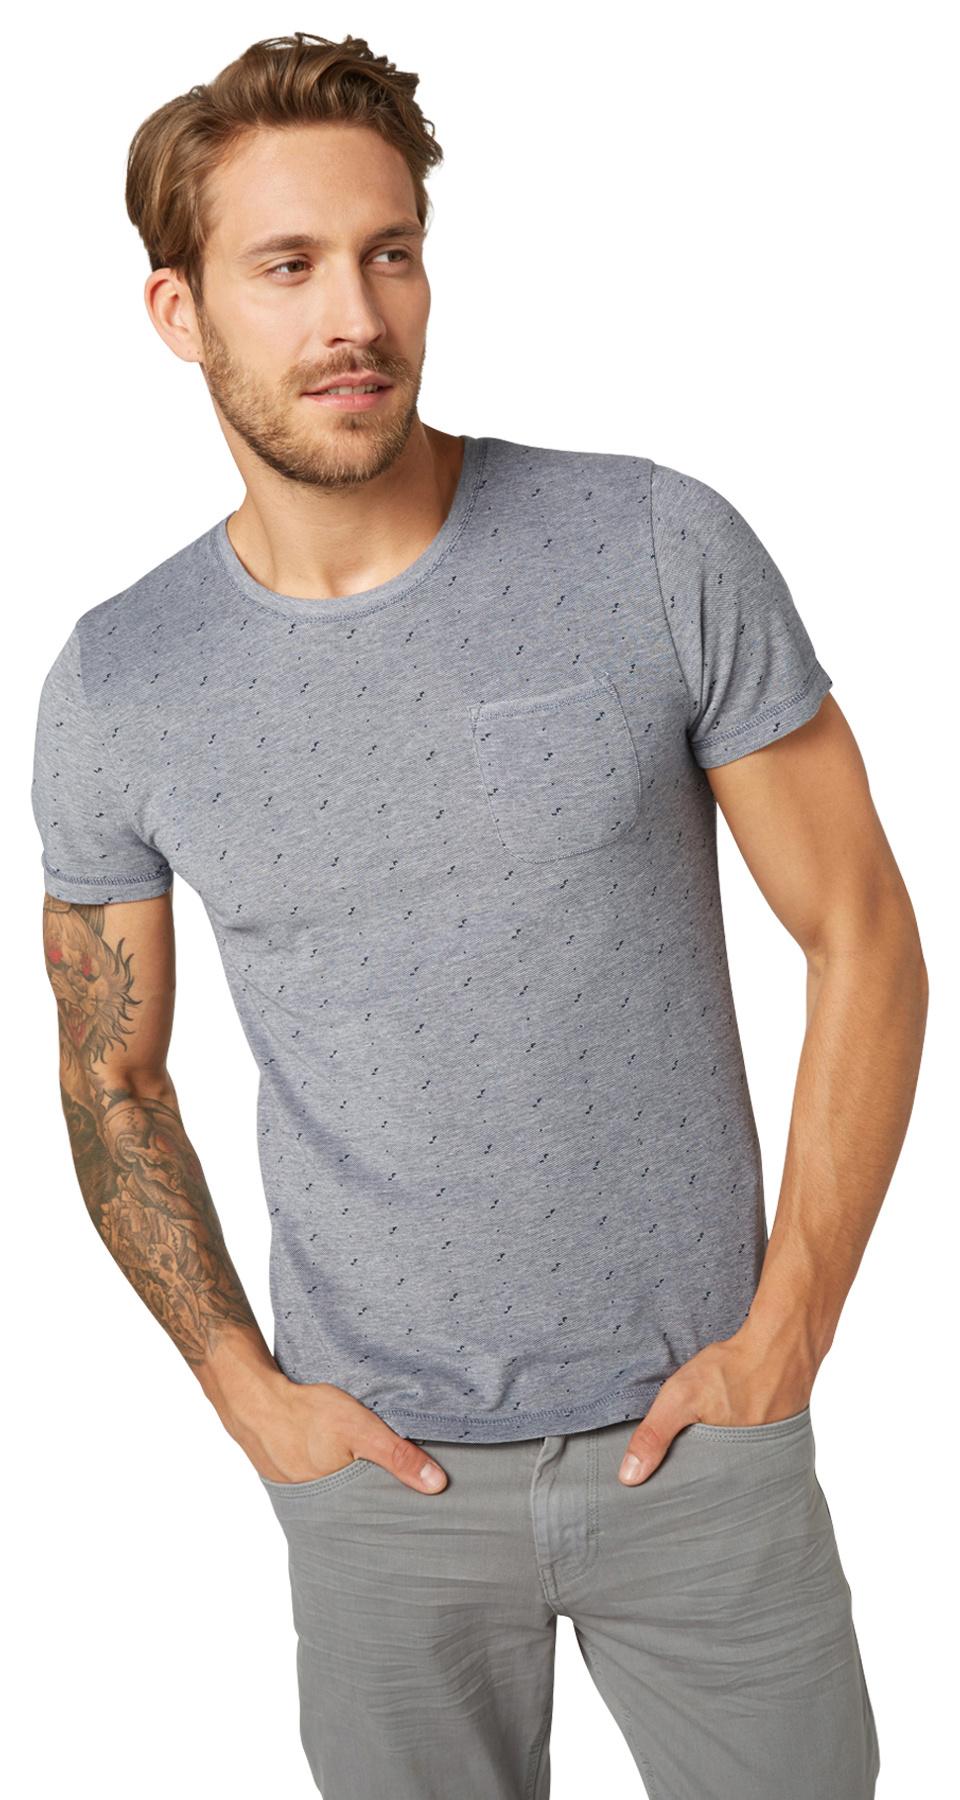 Tom Tailor pánské triko 10375306210/6740 Modrá XL